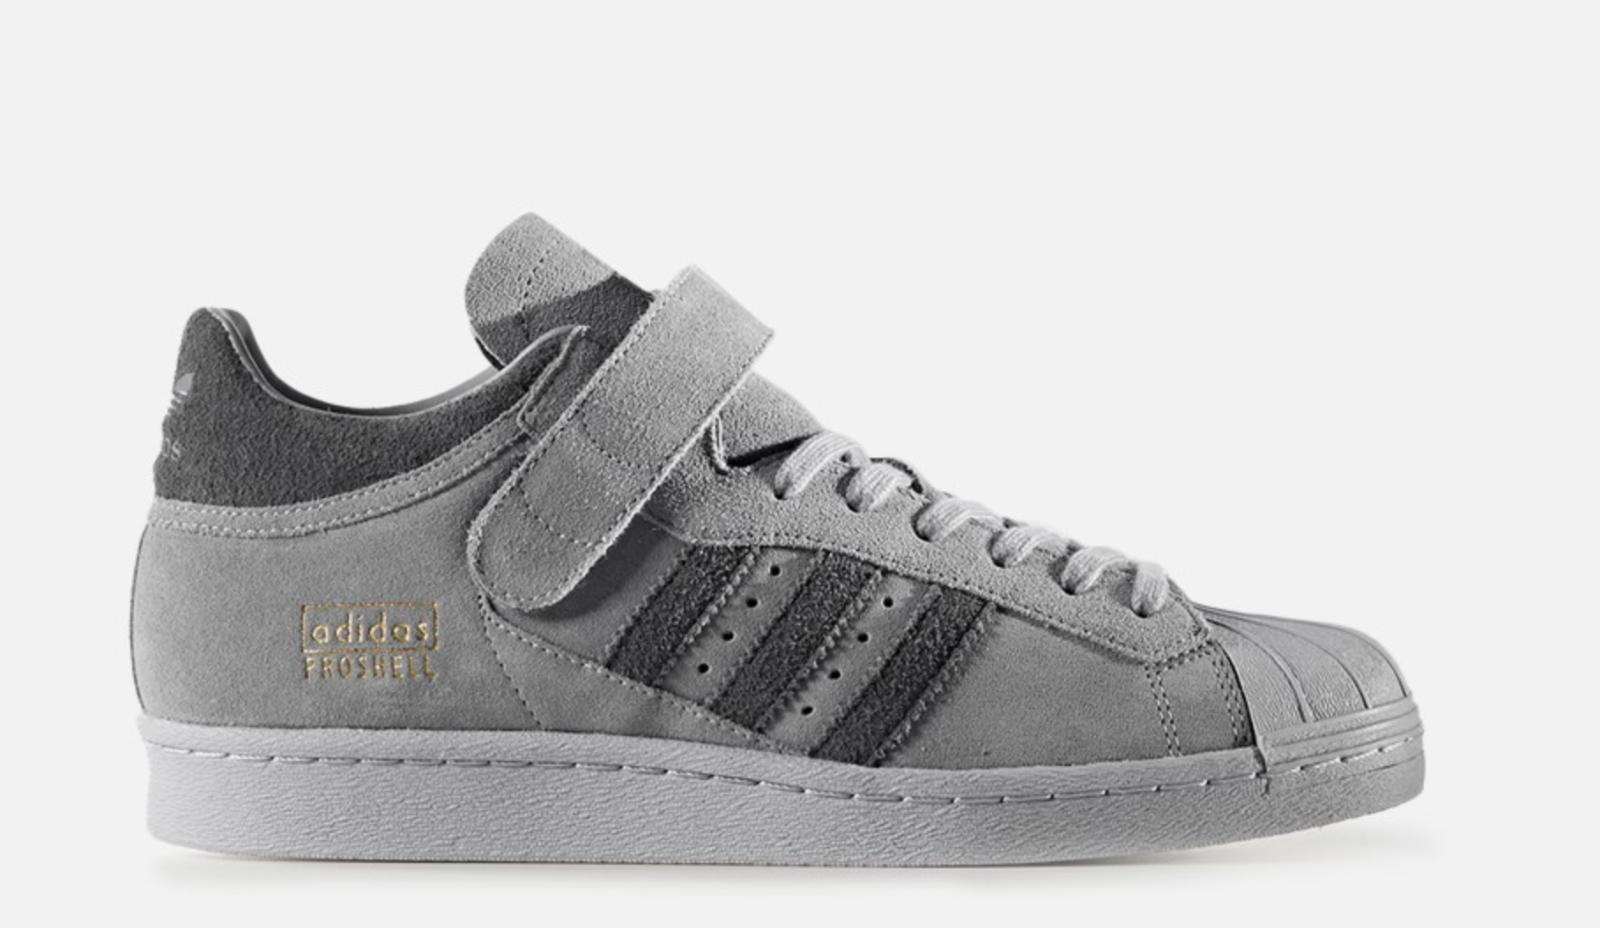 NEW adidas PRO SHELL BZ0210 Grey Mens Casual shoes Shelltoe s1